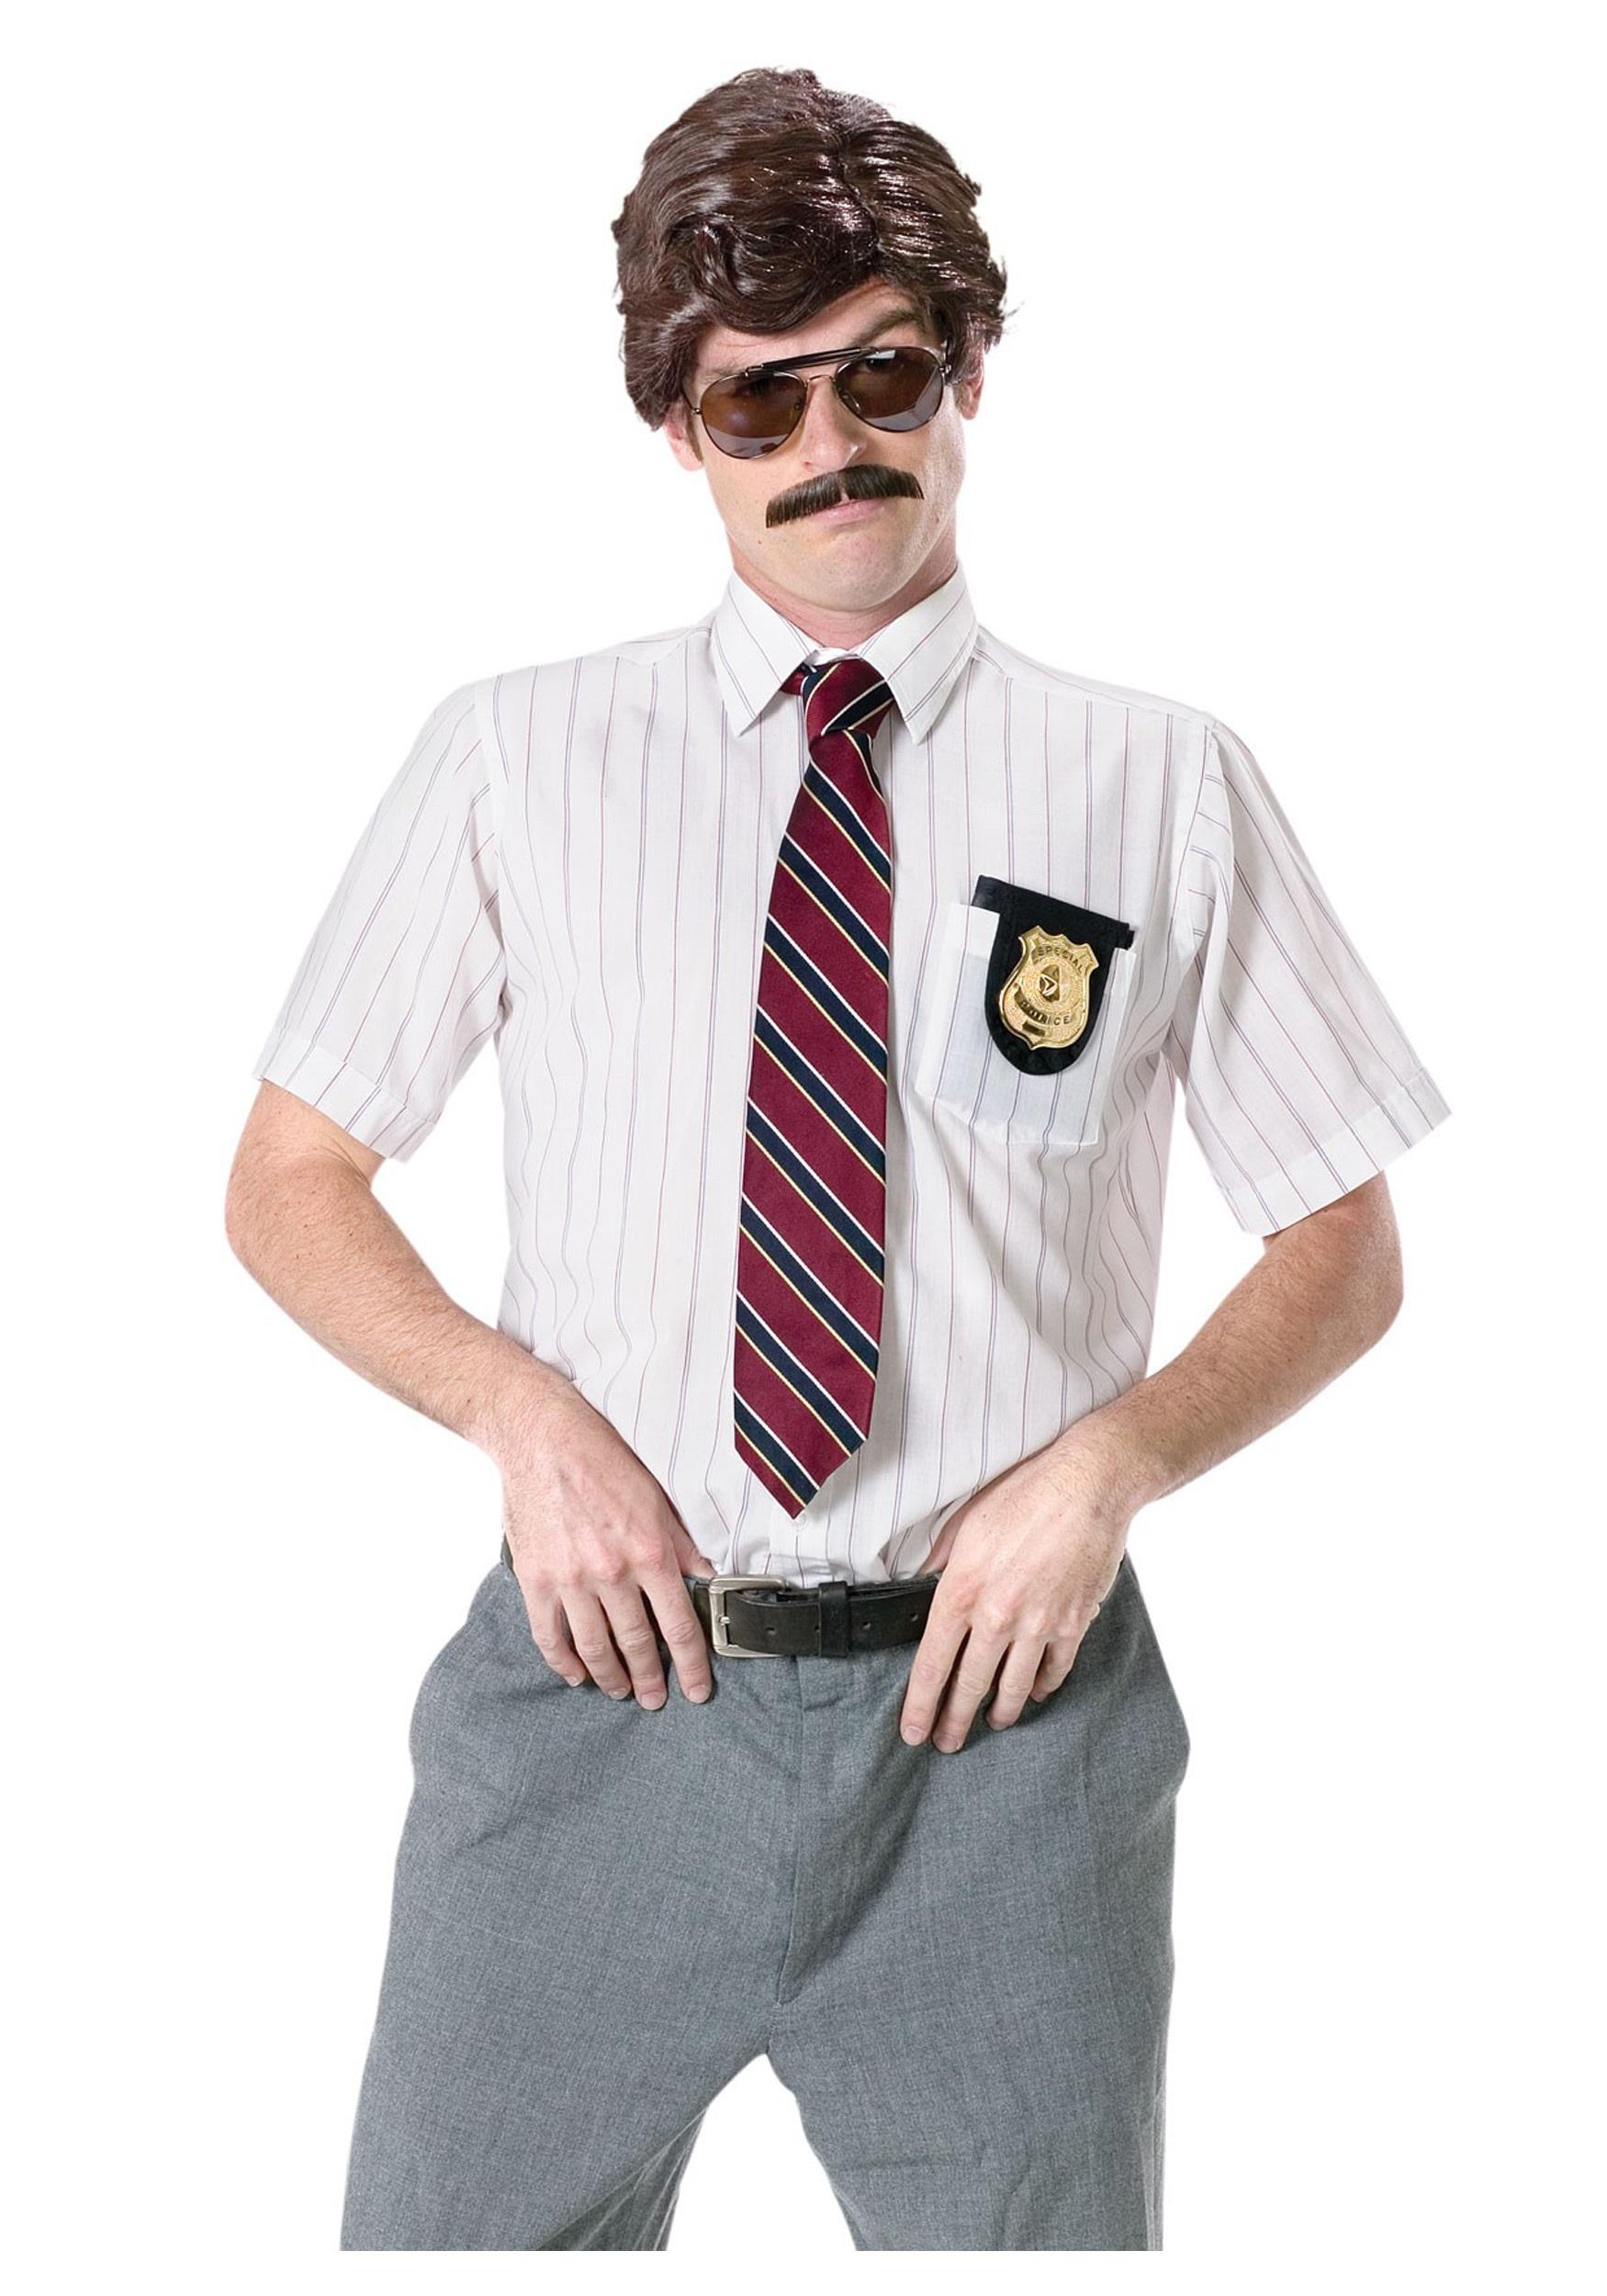 849f2b26ed 70s-detective-costume-kit.jpg